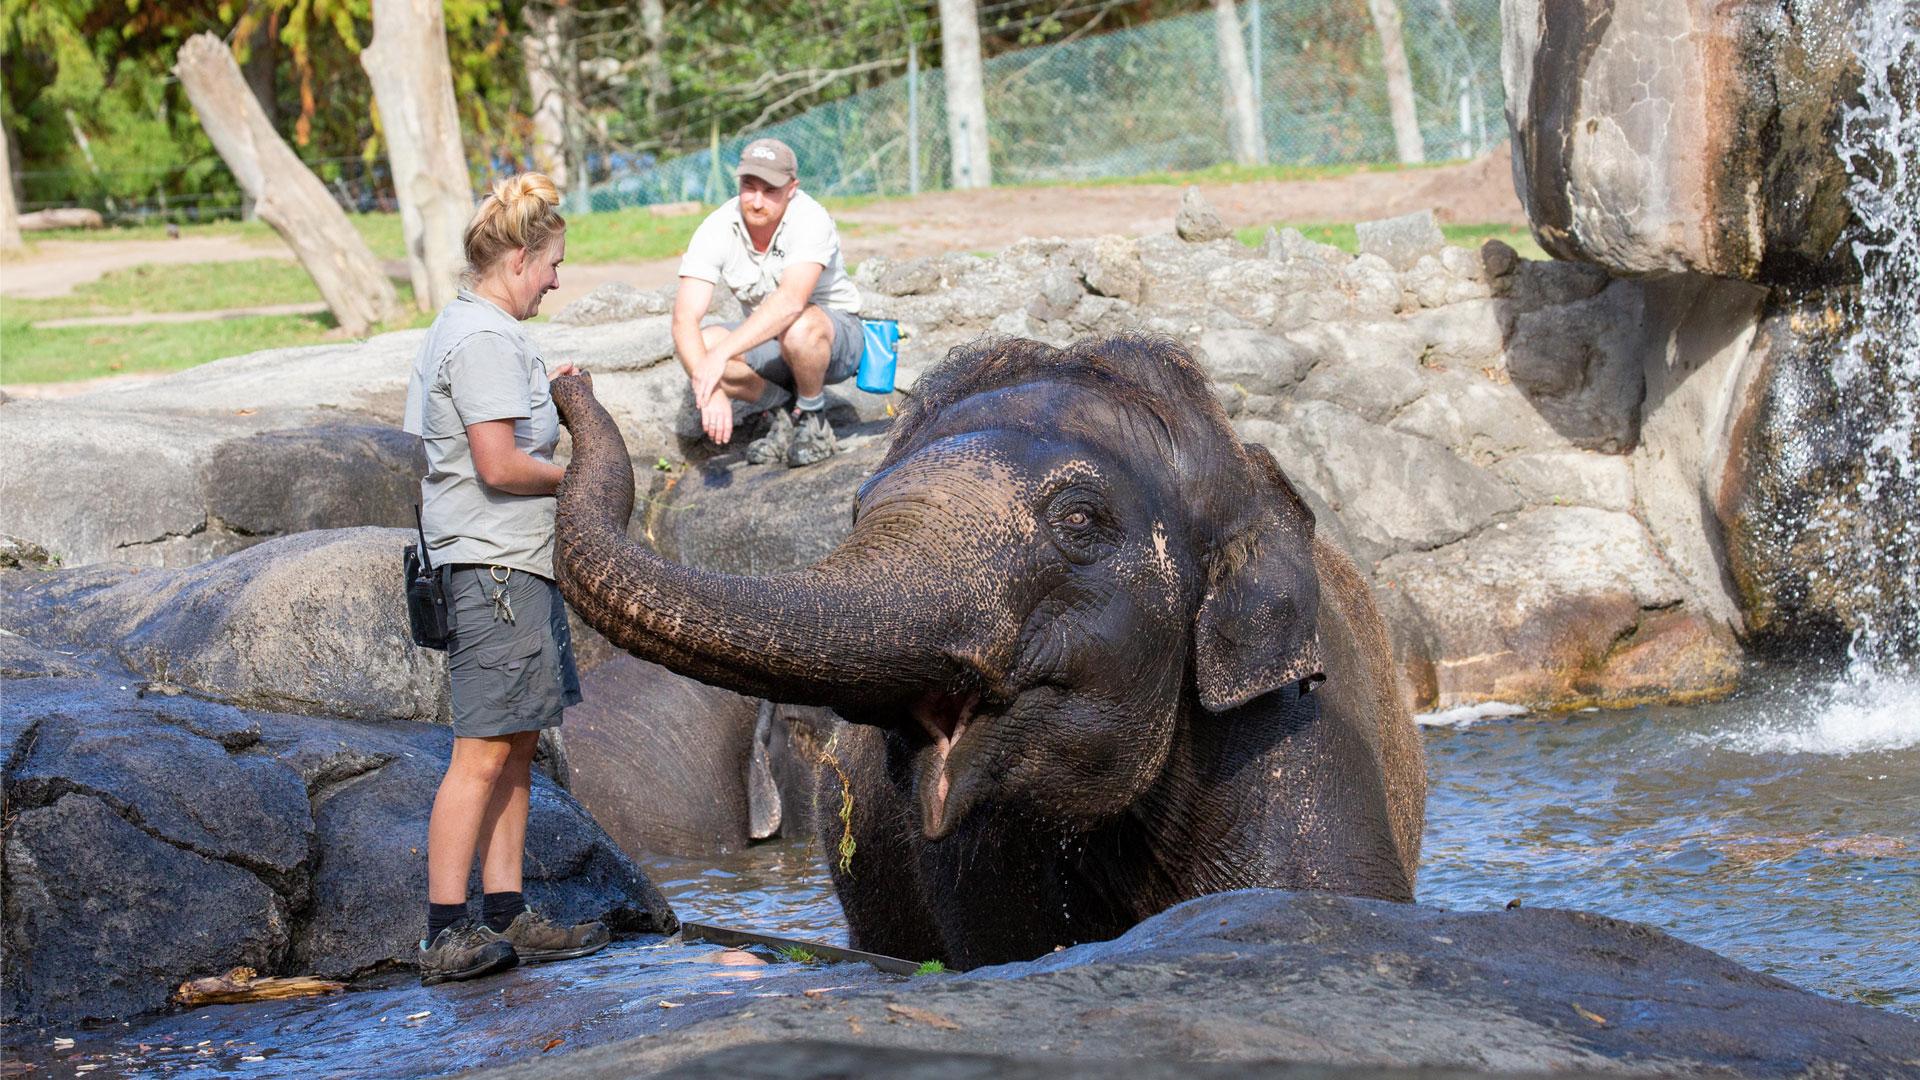 https://rfacdn.nz/zoo/assets/media/elephant-news-gallery-12.jpg